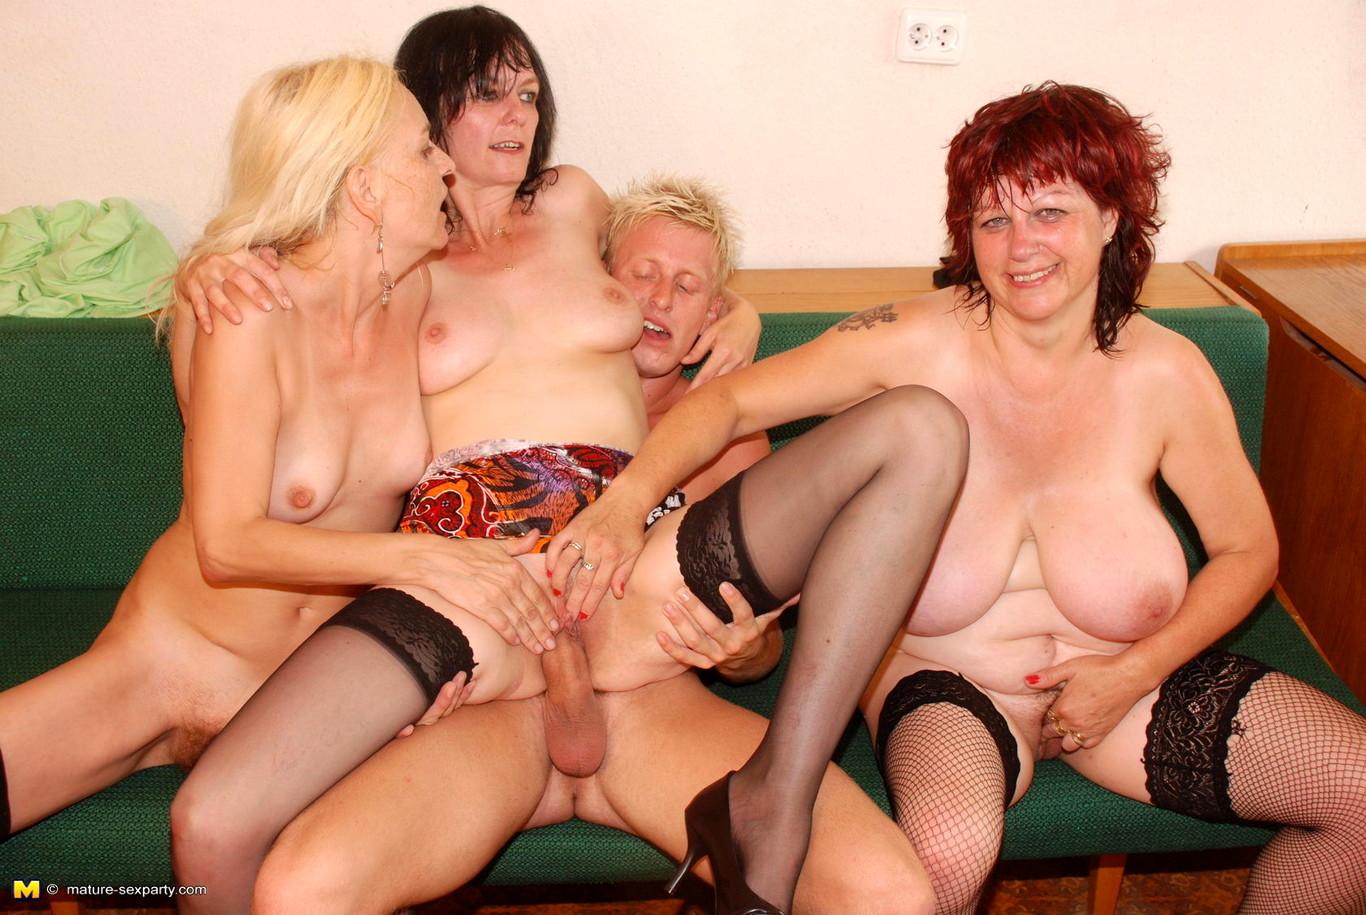 Фото двух мамаши порно, Милфы фото секса с мамочками и зрелками 23 фотография